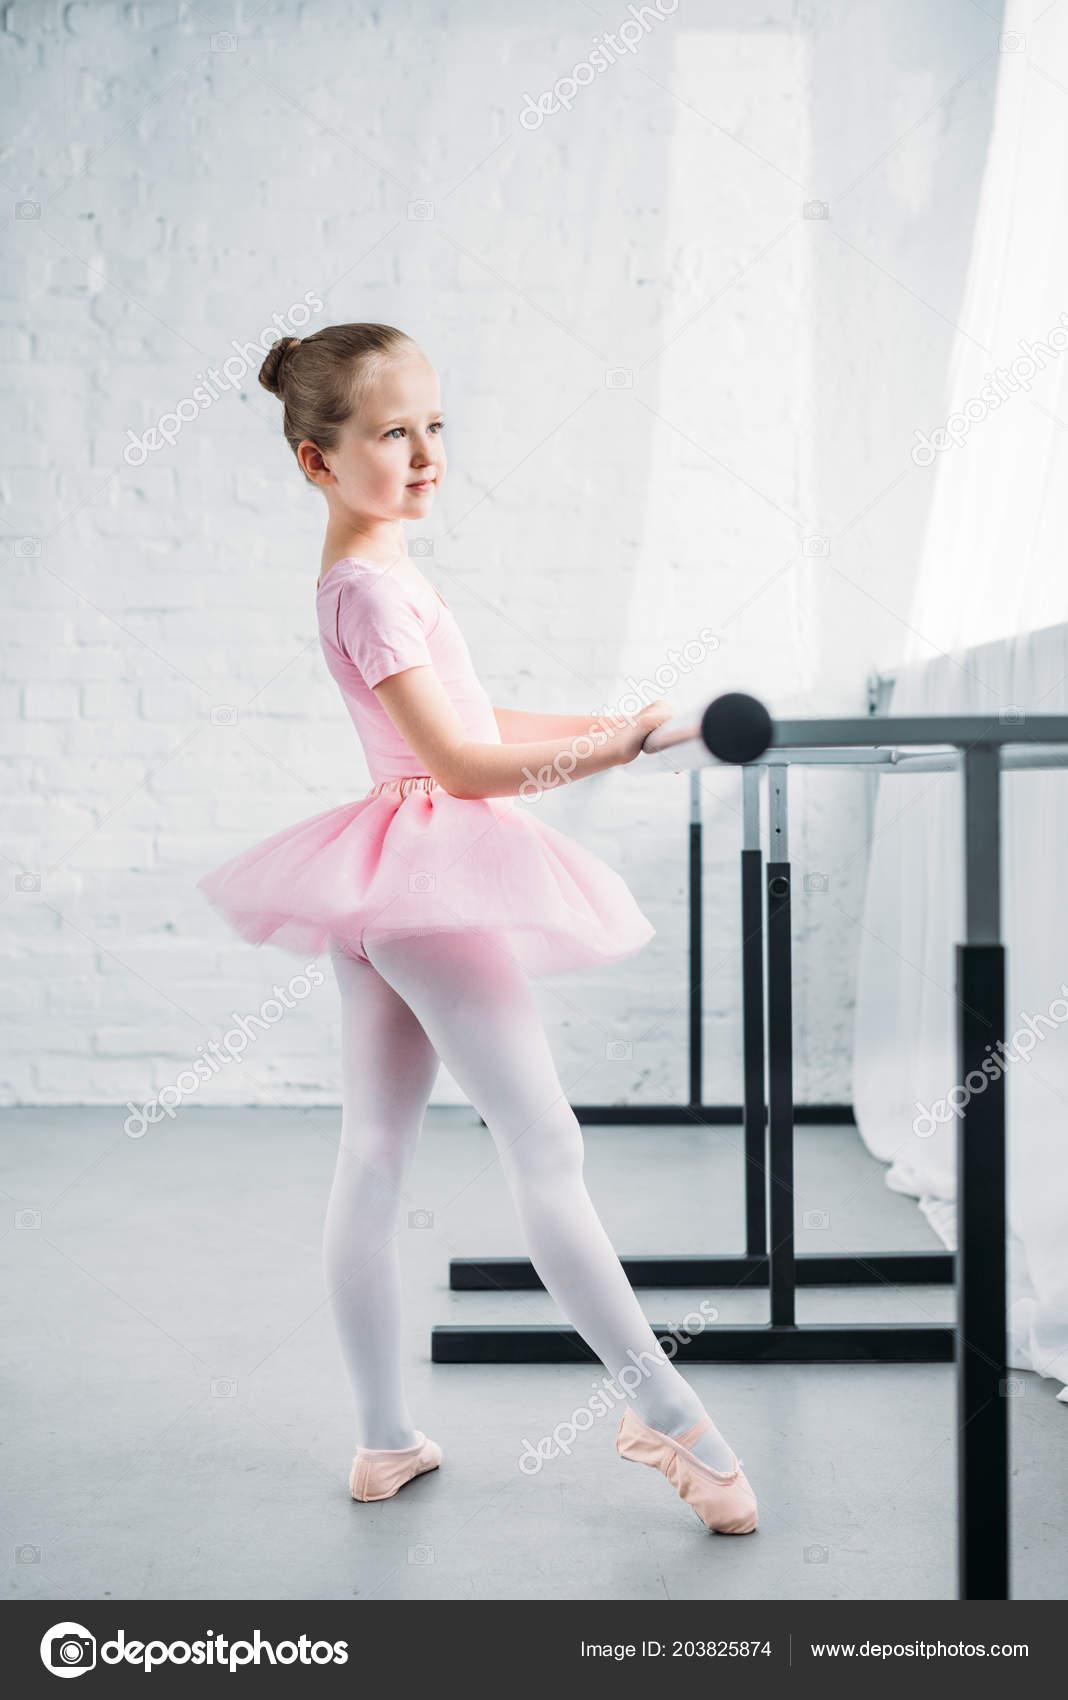 a6d07f99d7a Μερική Άποψη Του Μικρού Παιδιού Ροζ Τουτού Εξάσκηση Μπαλέτο Σχολή — Φωτογραφία  Αρχείου